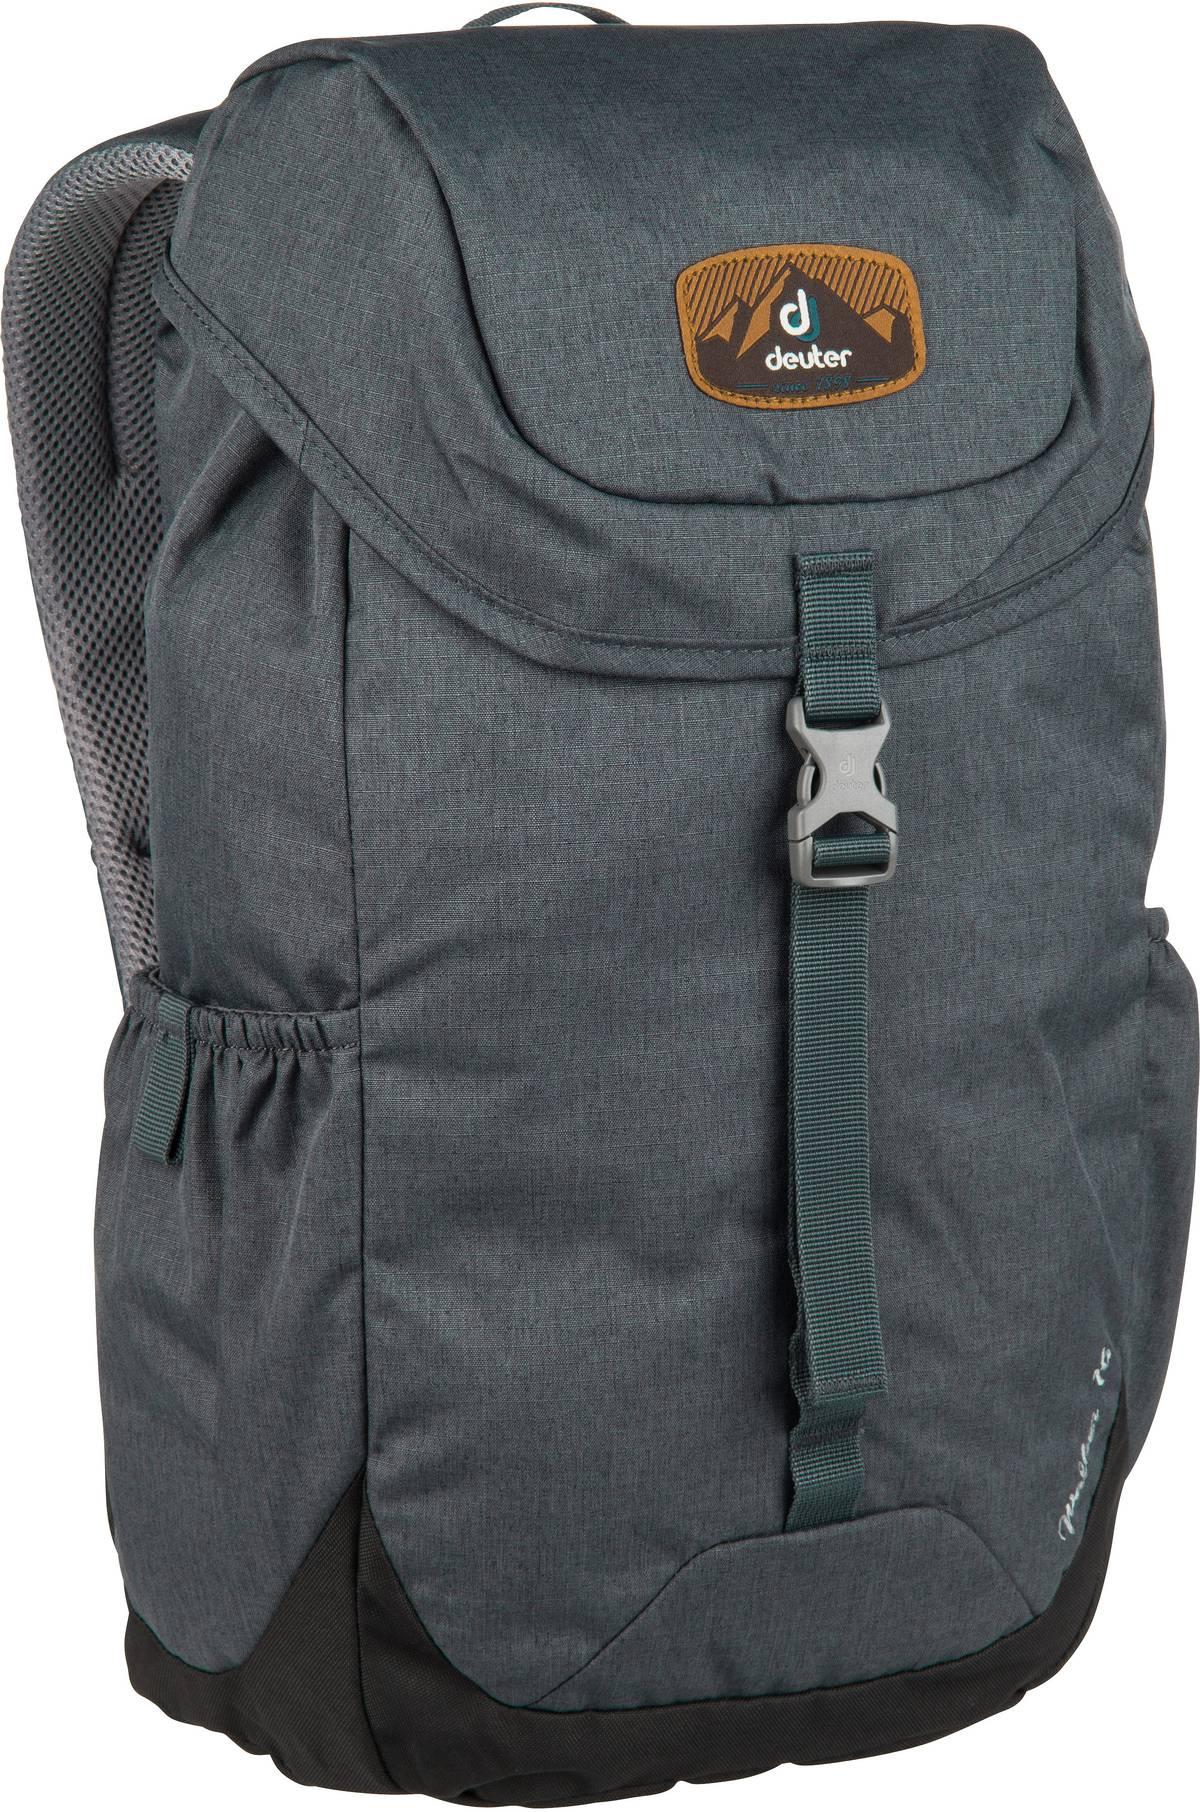 Rucksack / Daypack Walker 16 Graphite/Black (16 Liter)